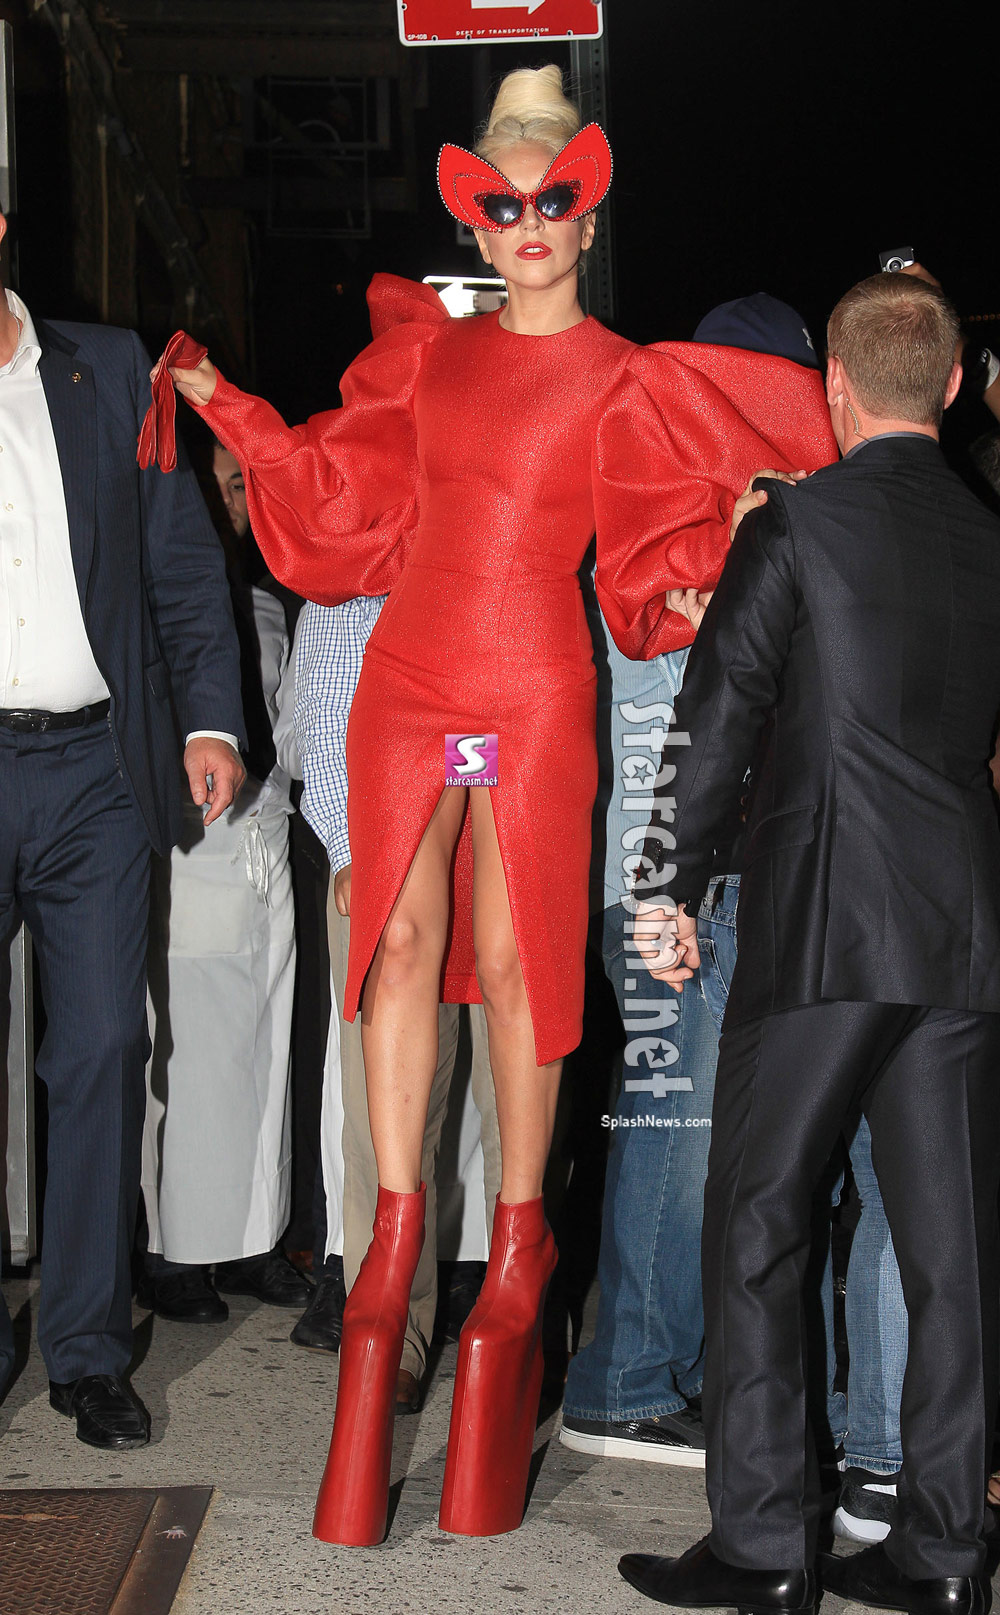 Lady Gaga exposed her pierced Vagina for Vanity Fair shoot